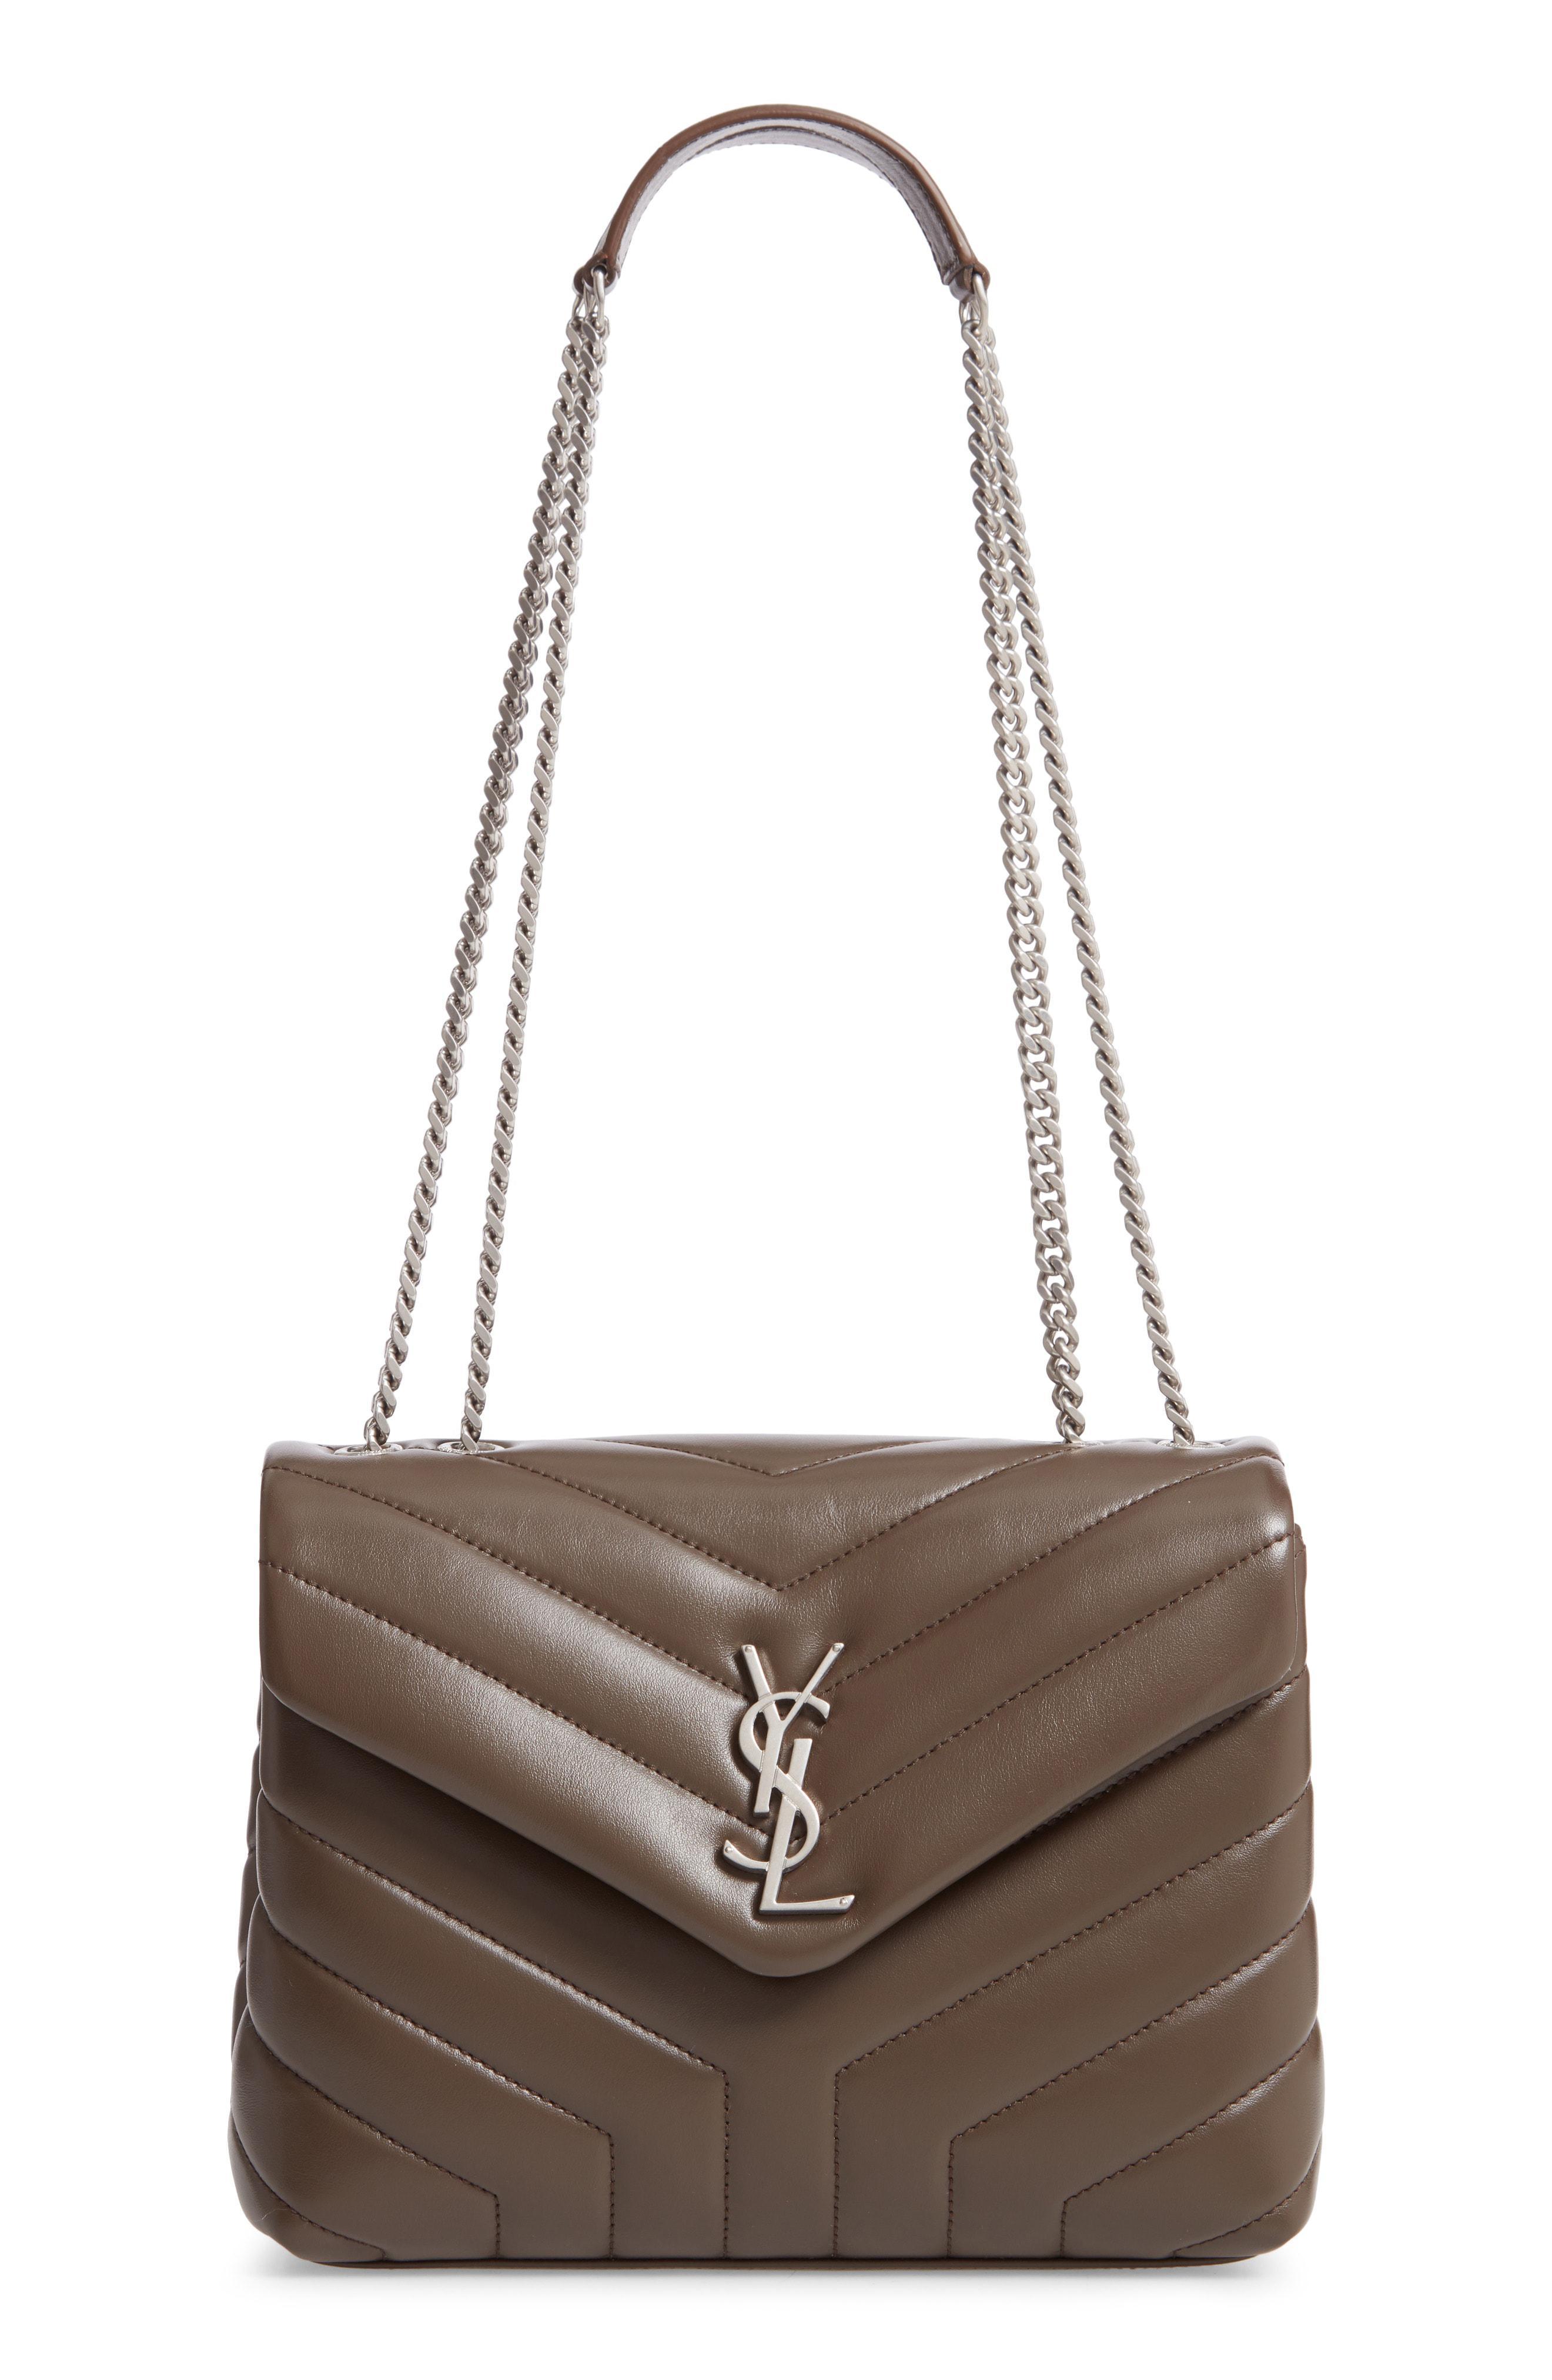 3f34aa858 Saint Laurent - Brown Small Loulou Matelasse Leather Shoulder Bag - Lyst